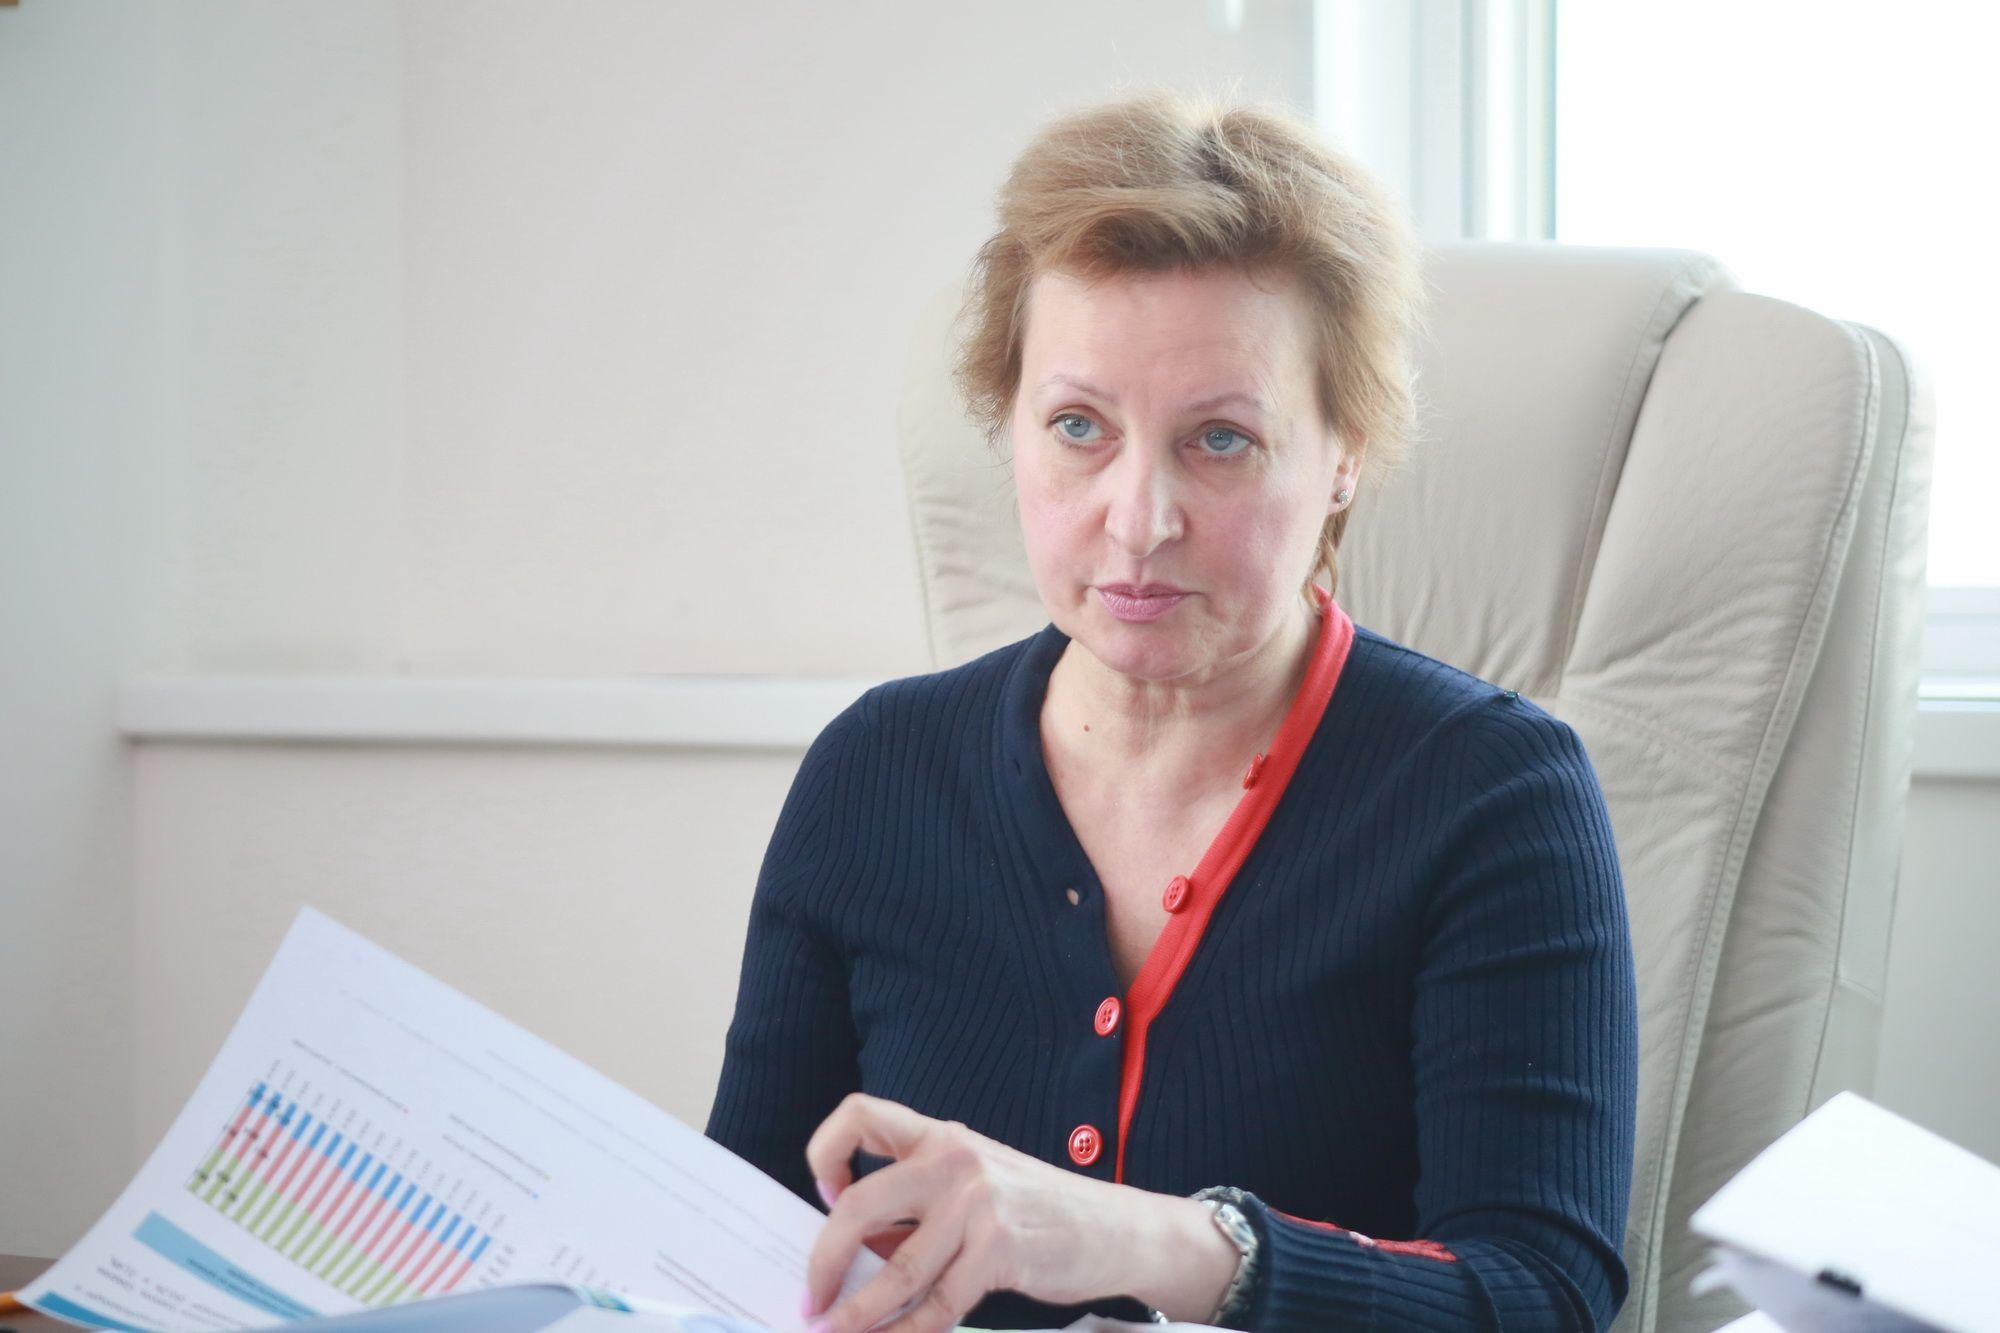 Елена Бахмутова: Дьявол кроется в деталях  219902 - Kapital.kz